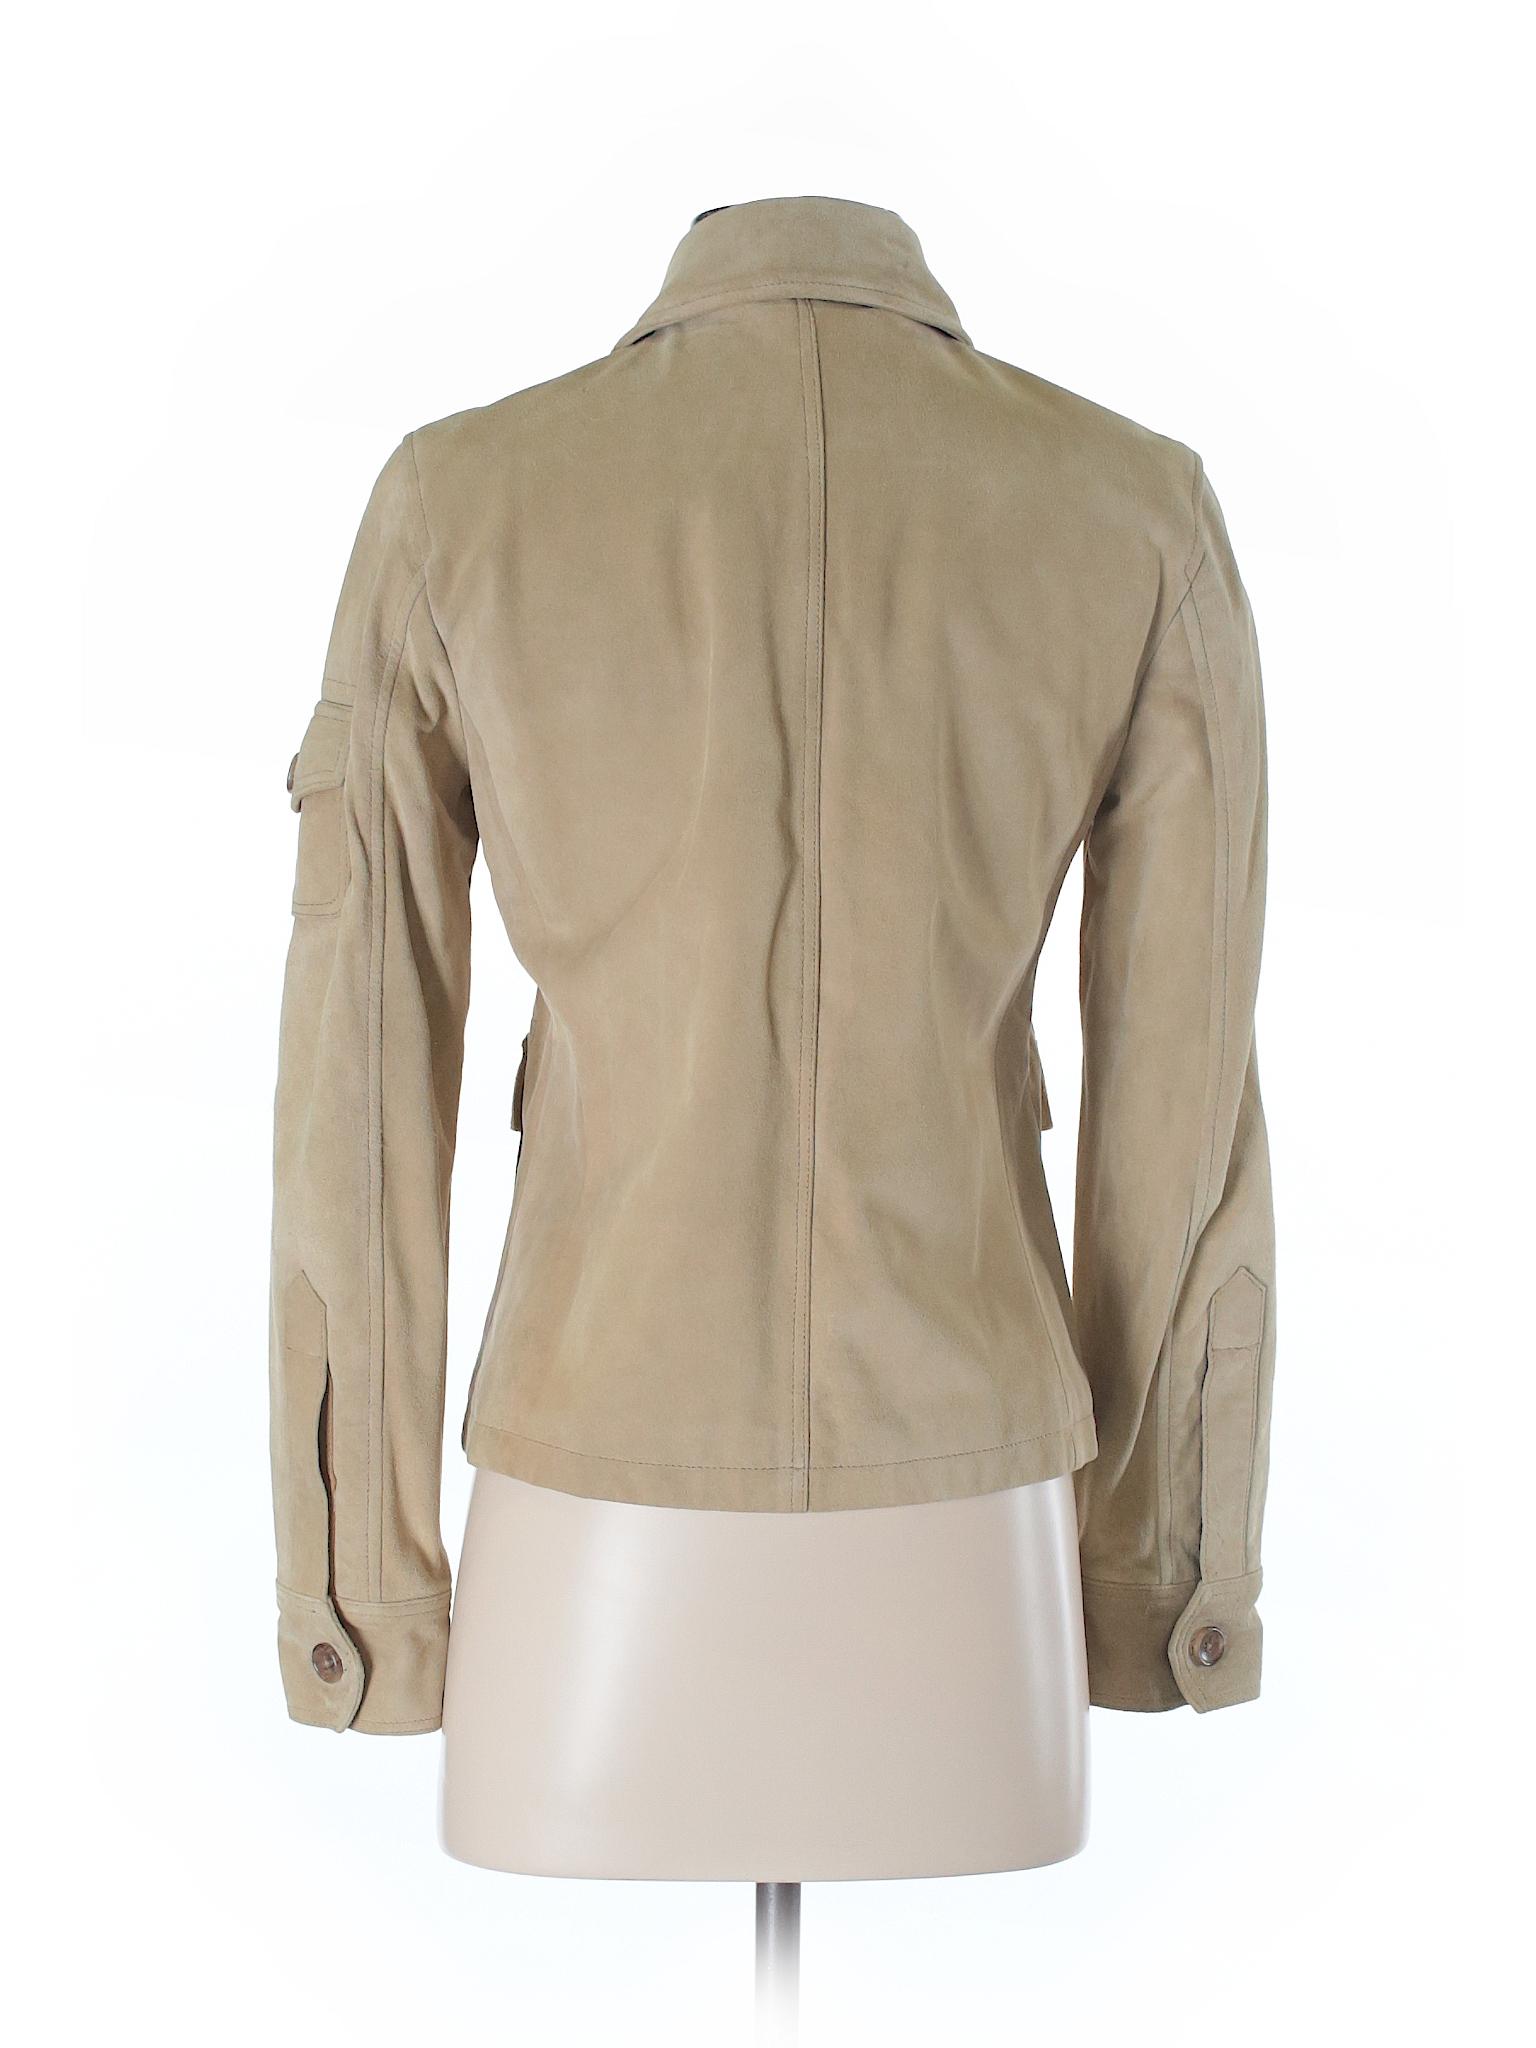 Boutique Jacket Crew Leather winter J 0wqzx0Tr